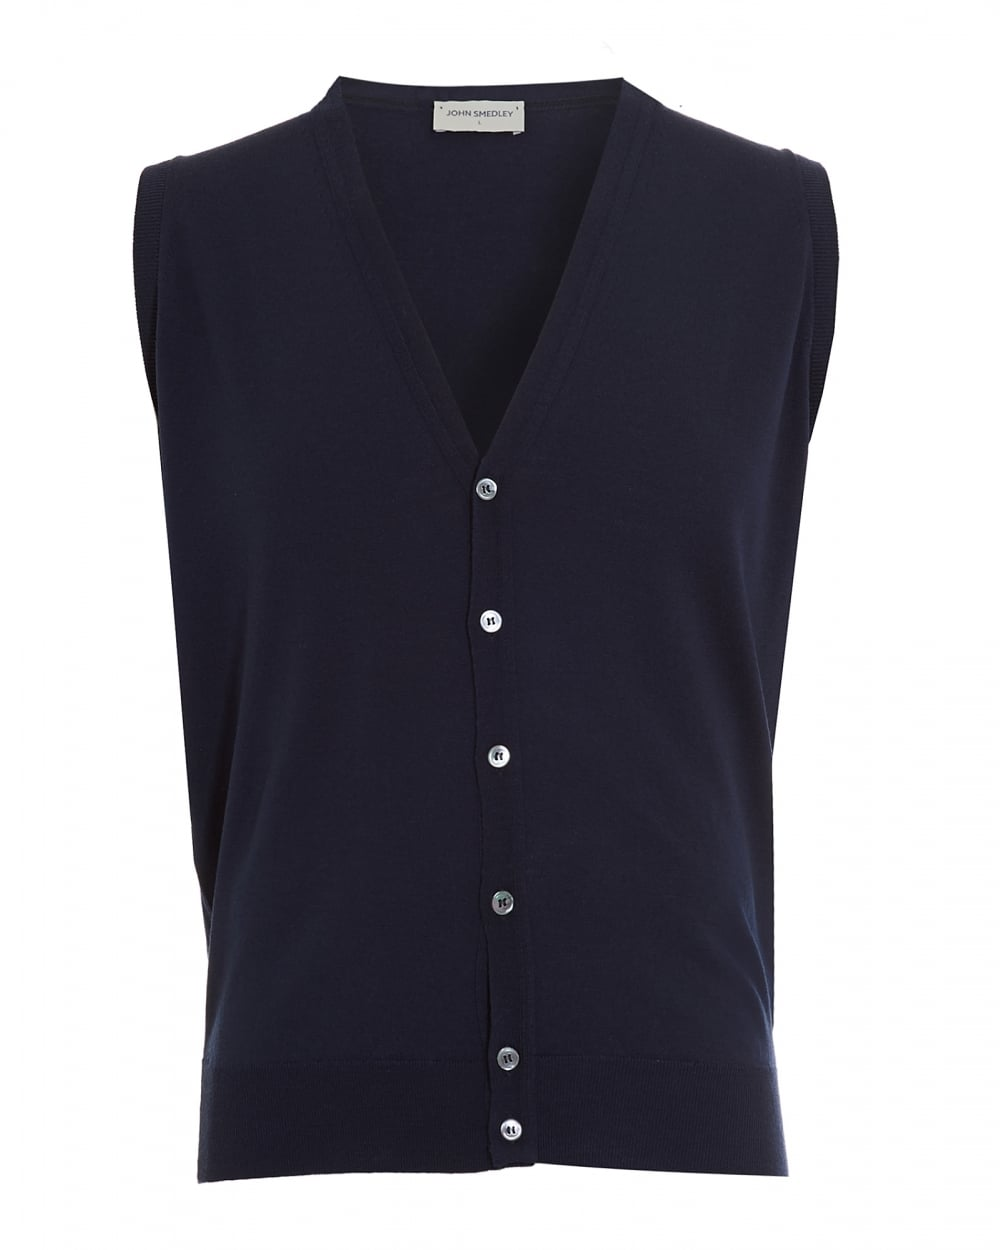 John Smedley Mens Sweater, Finagon Button Up Midnight Blue Vest